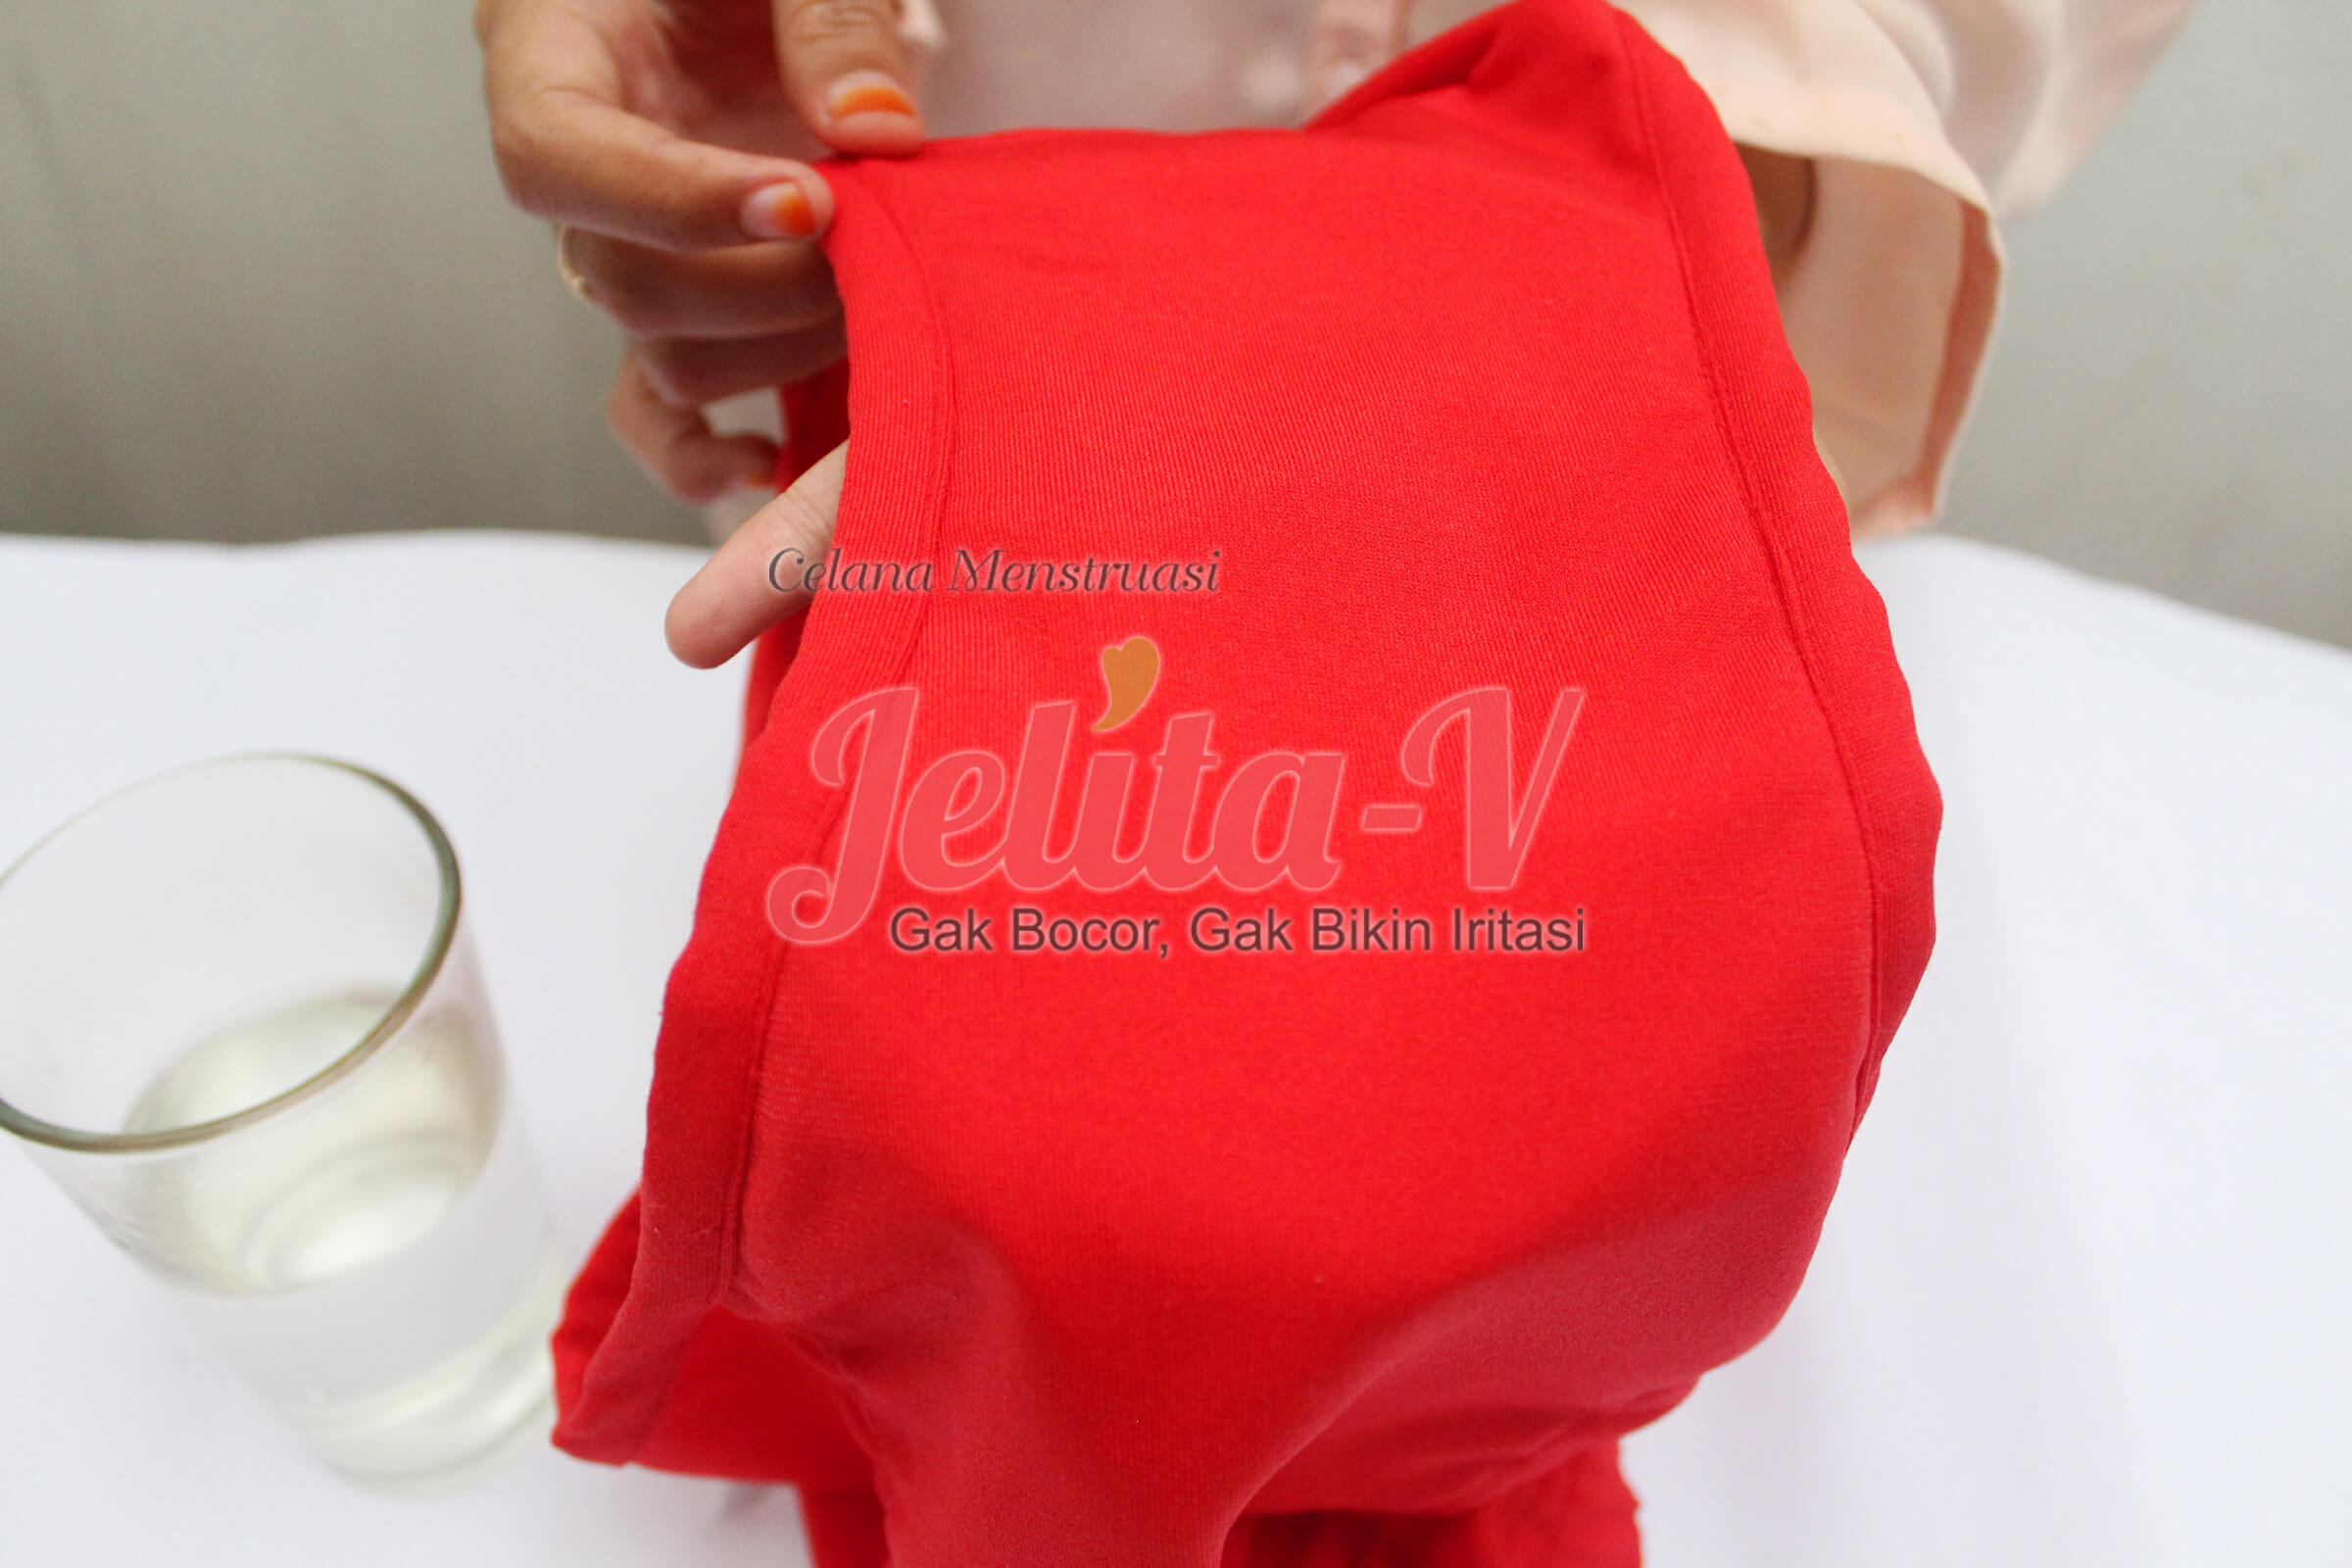 test-waterproof-celana-menstruasi-jelita-4